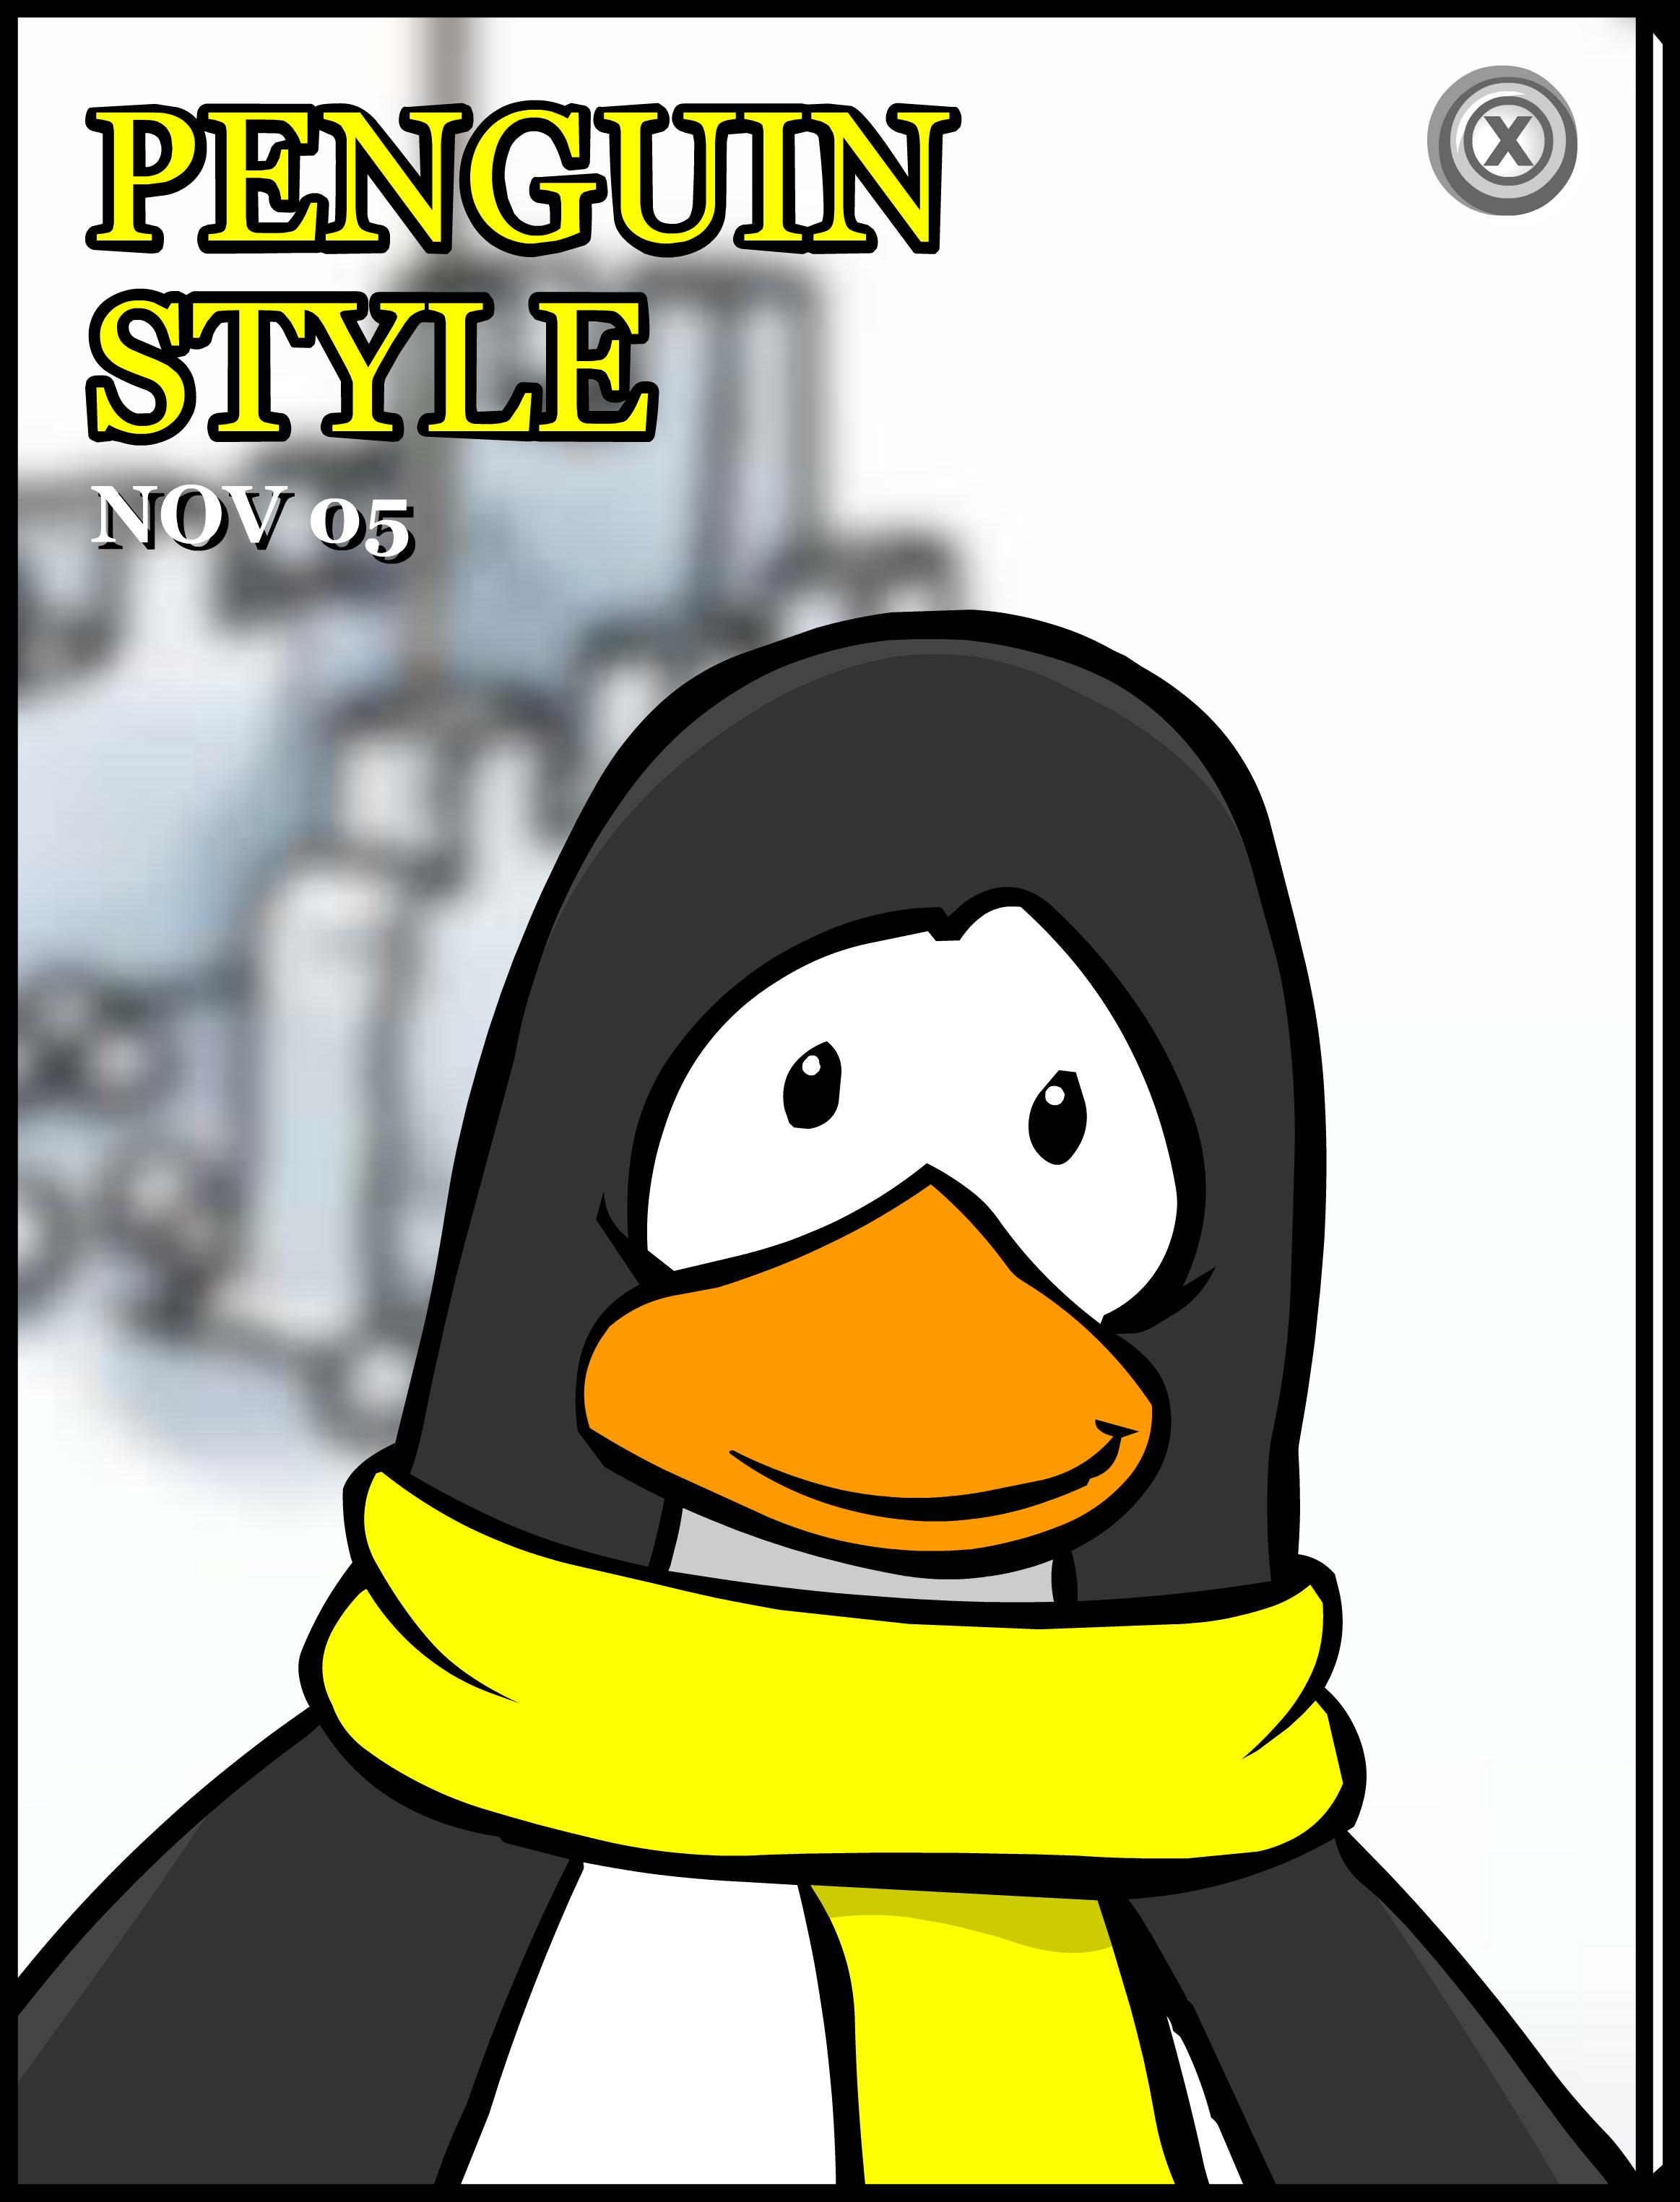 File:Penguin Style November 2005.png